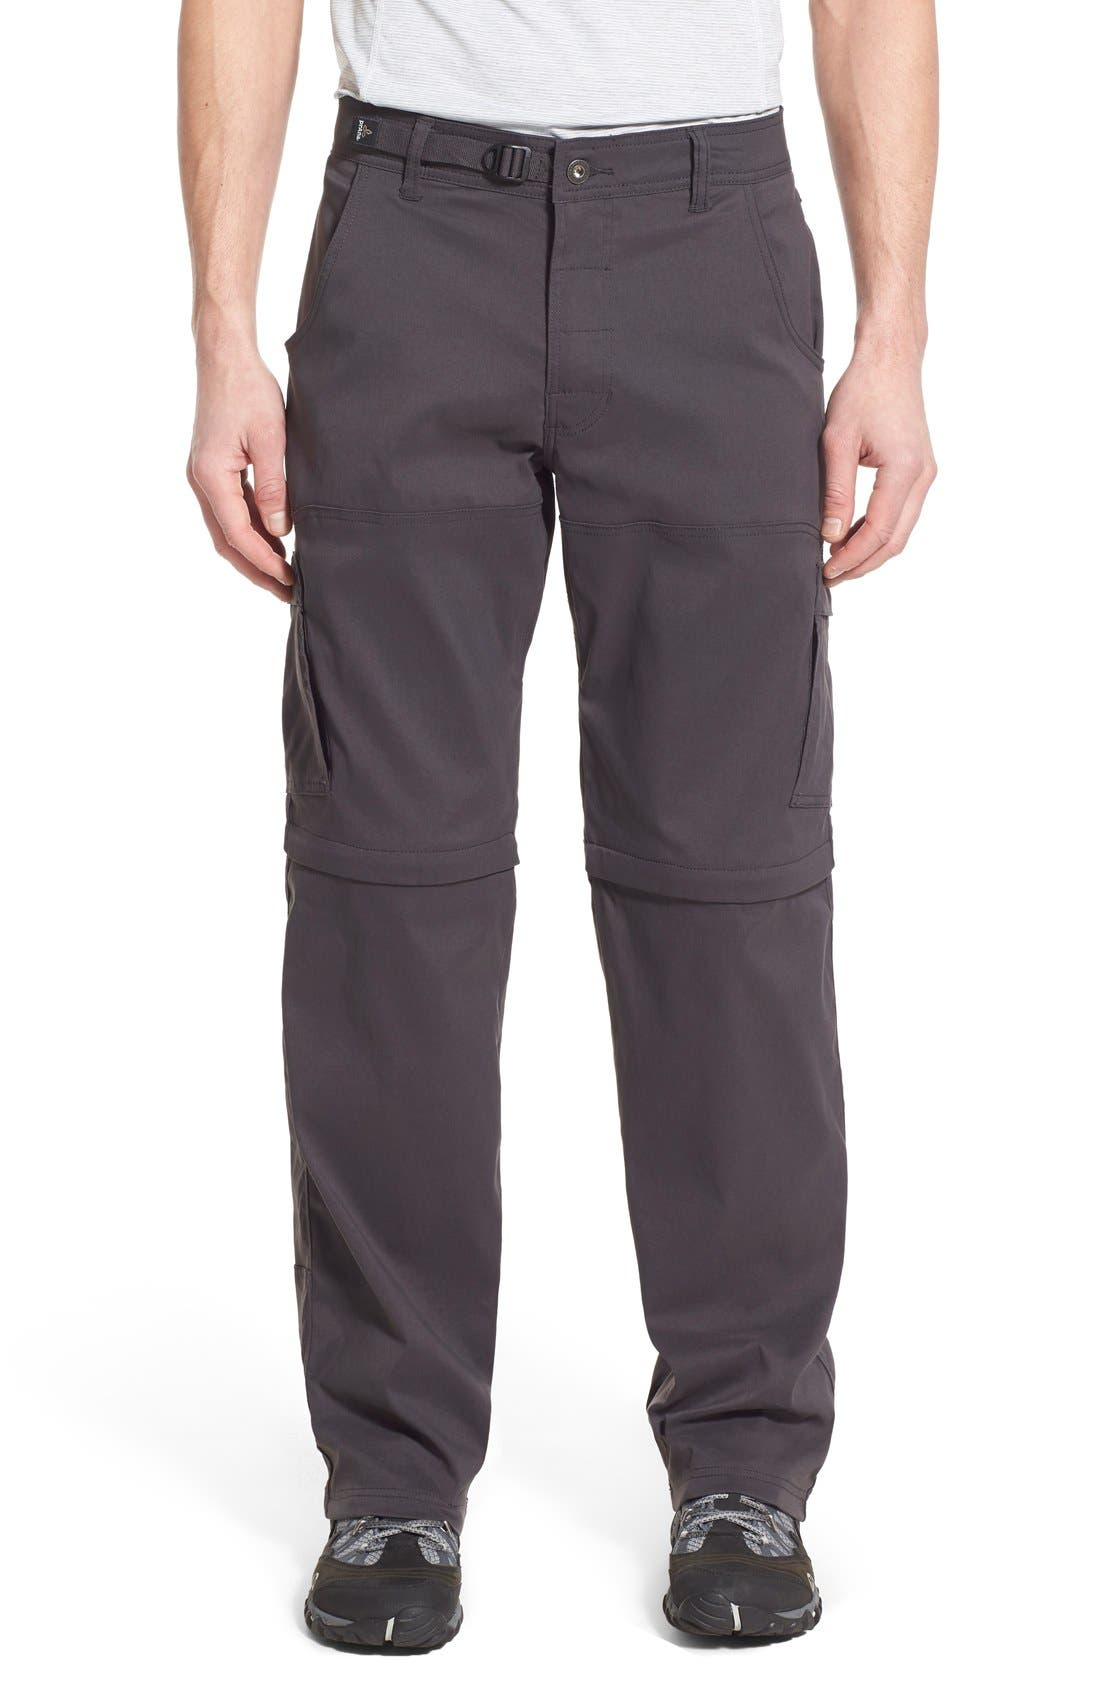 PRANA 'Zion' Convertible Cargo Hiking Pants